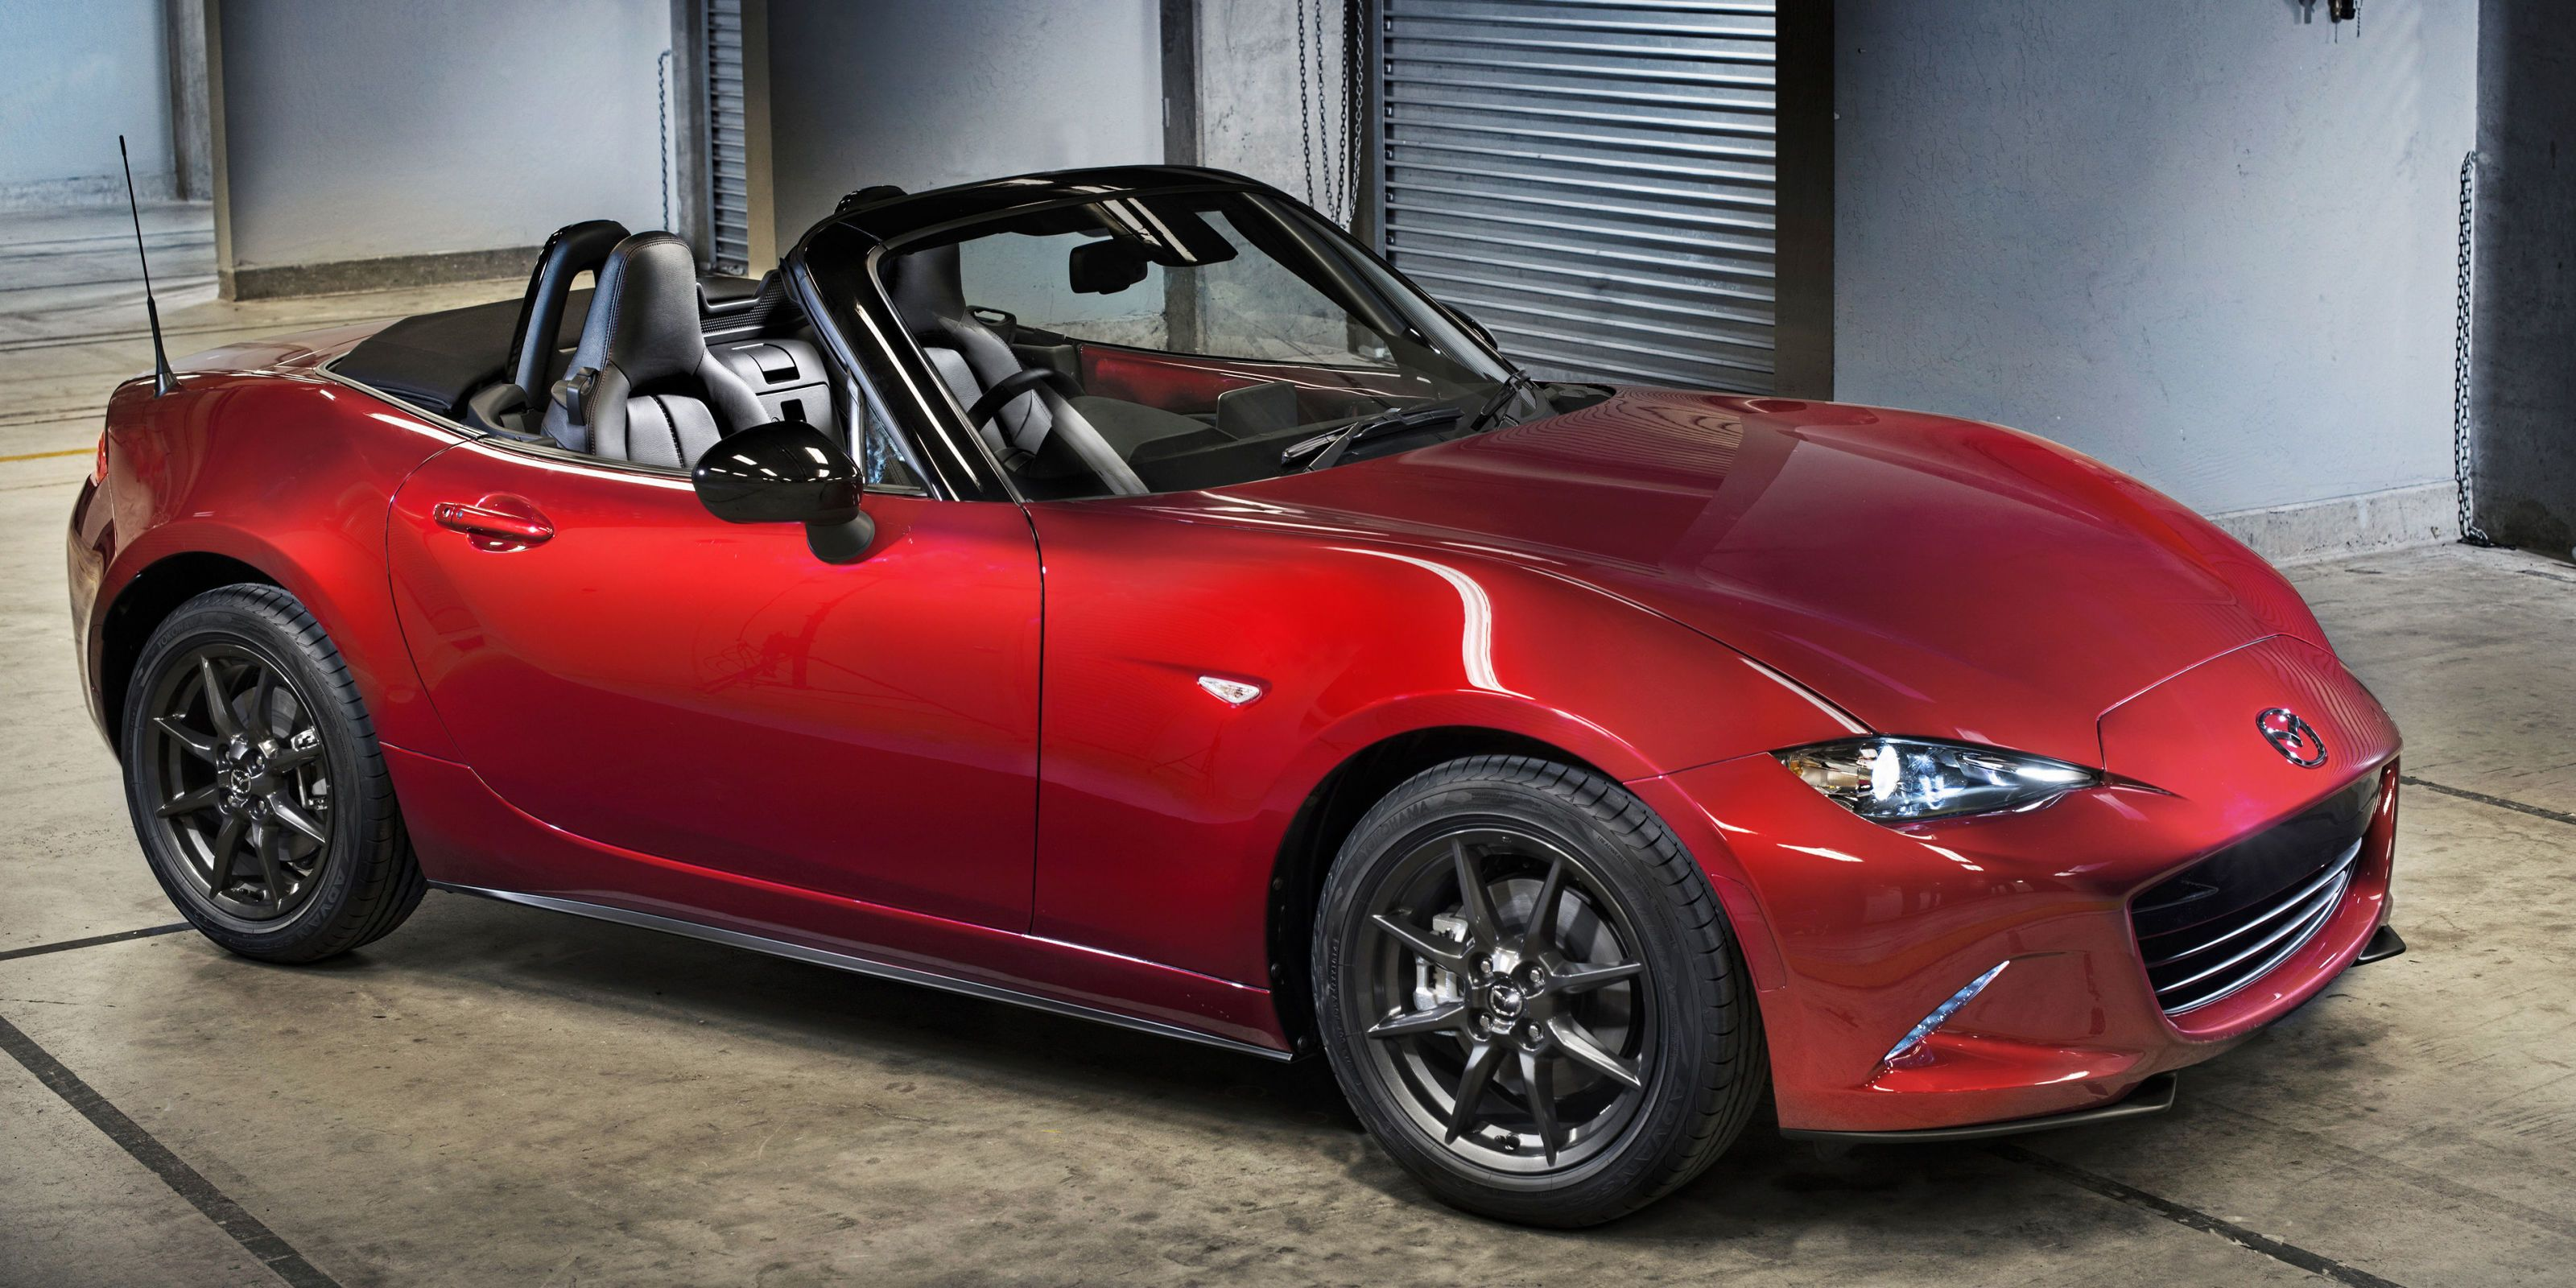 Mazda miata pics